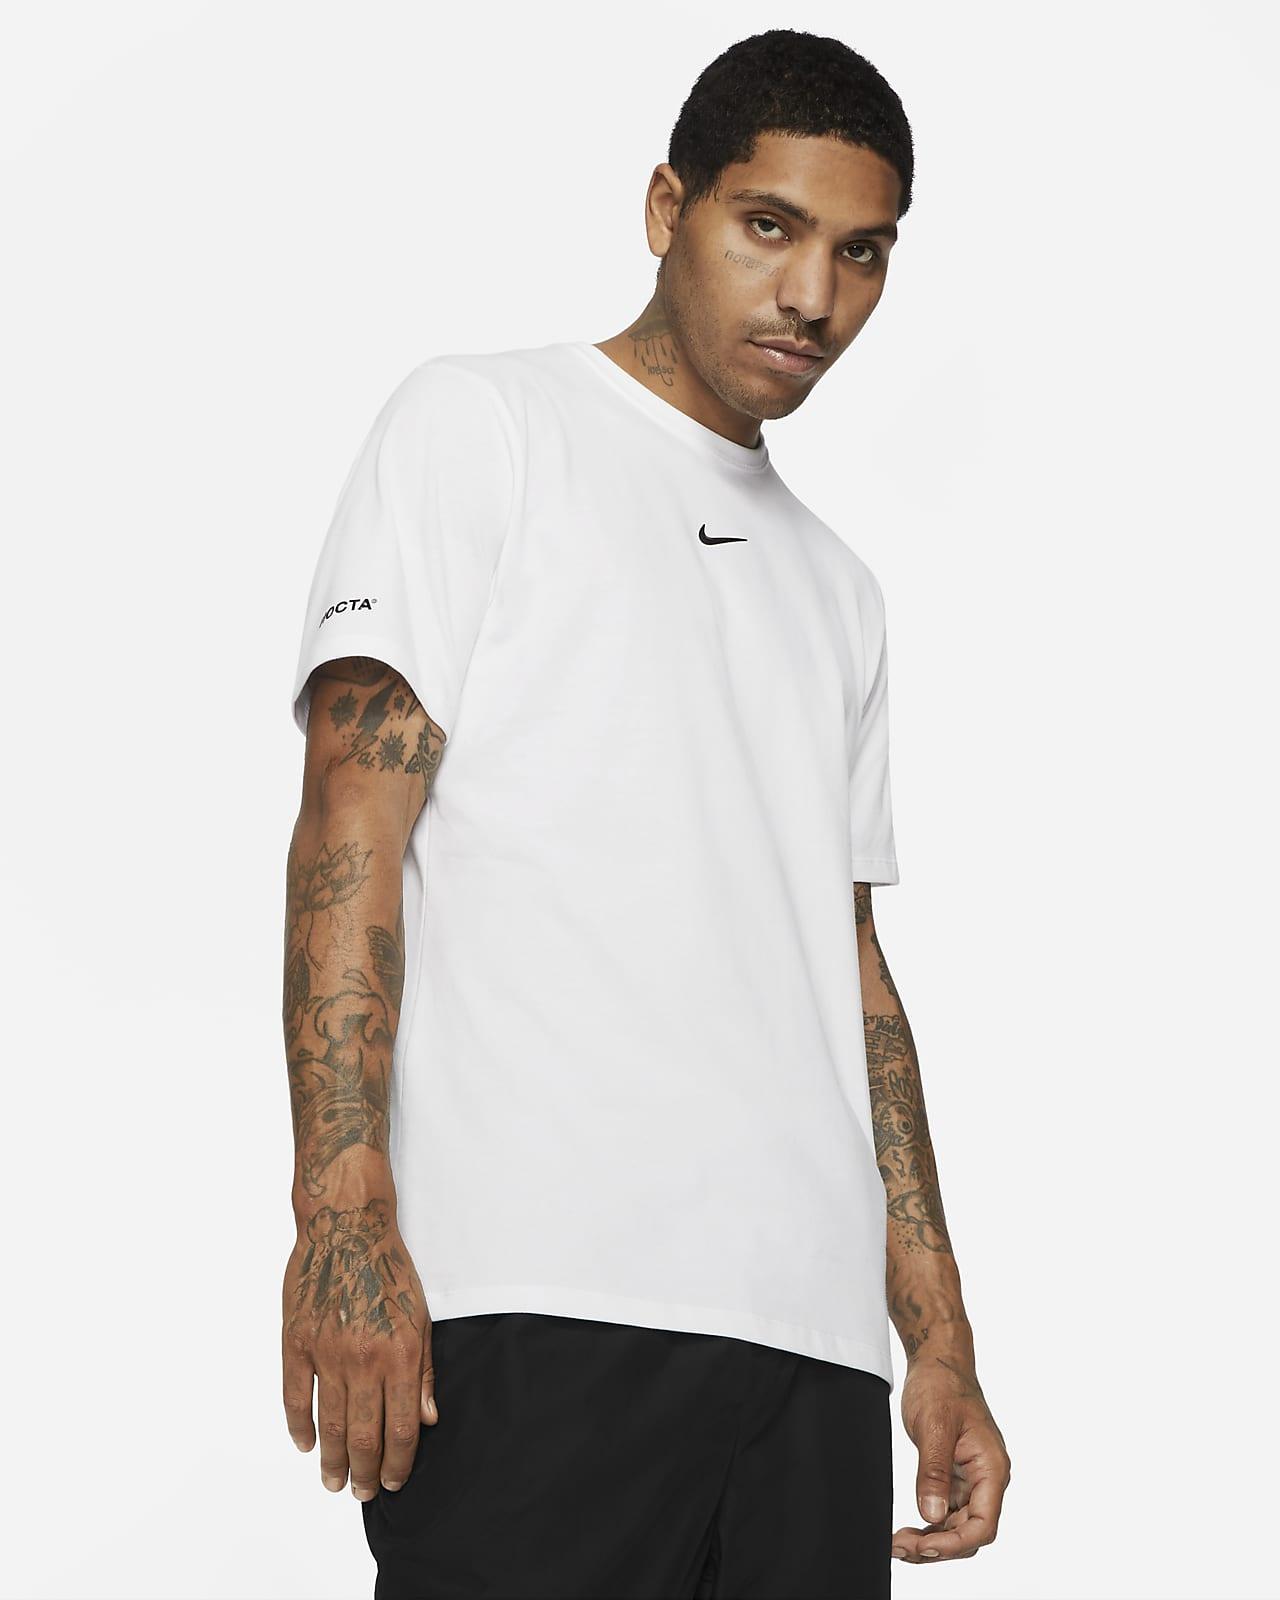 NOCTA Short-Sleeve Top